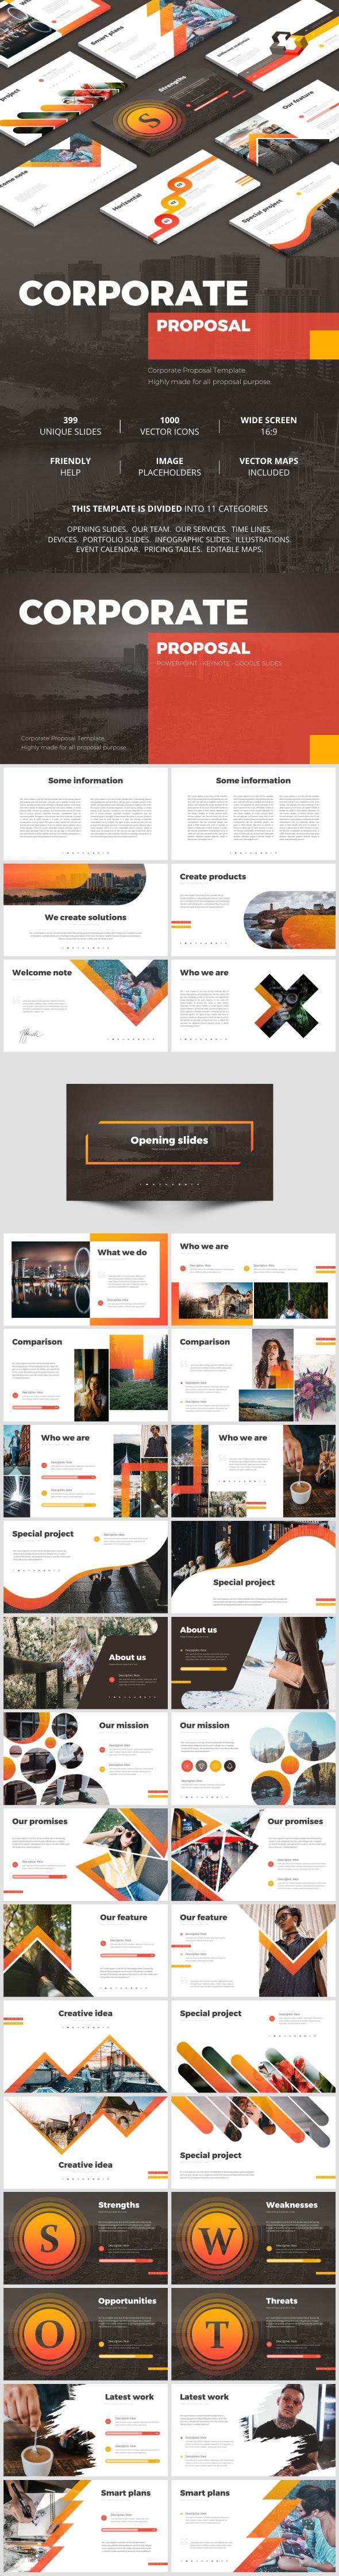 Corporate Proposal - Google Slides Presentation Templates